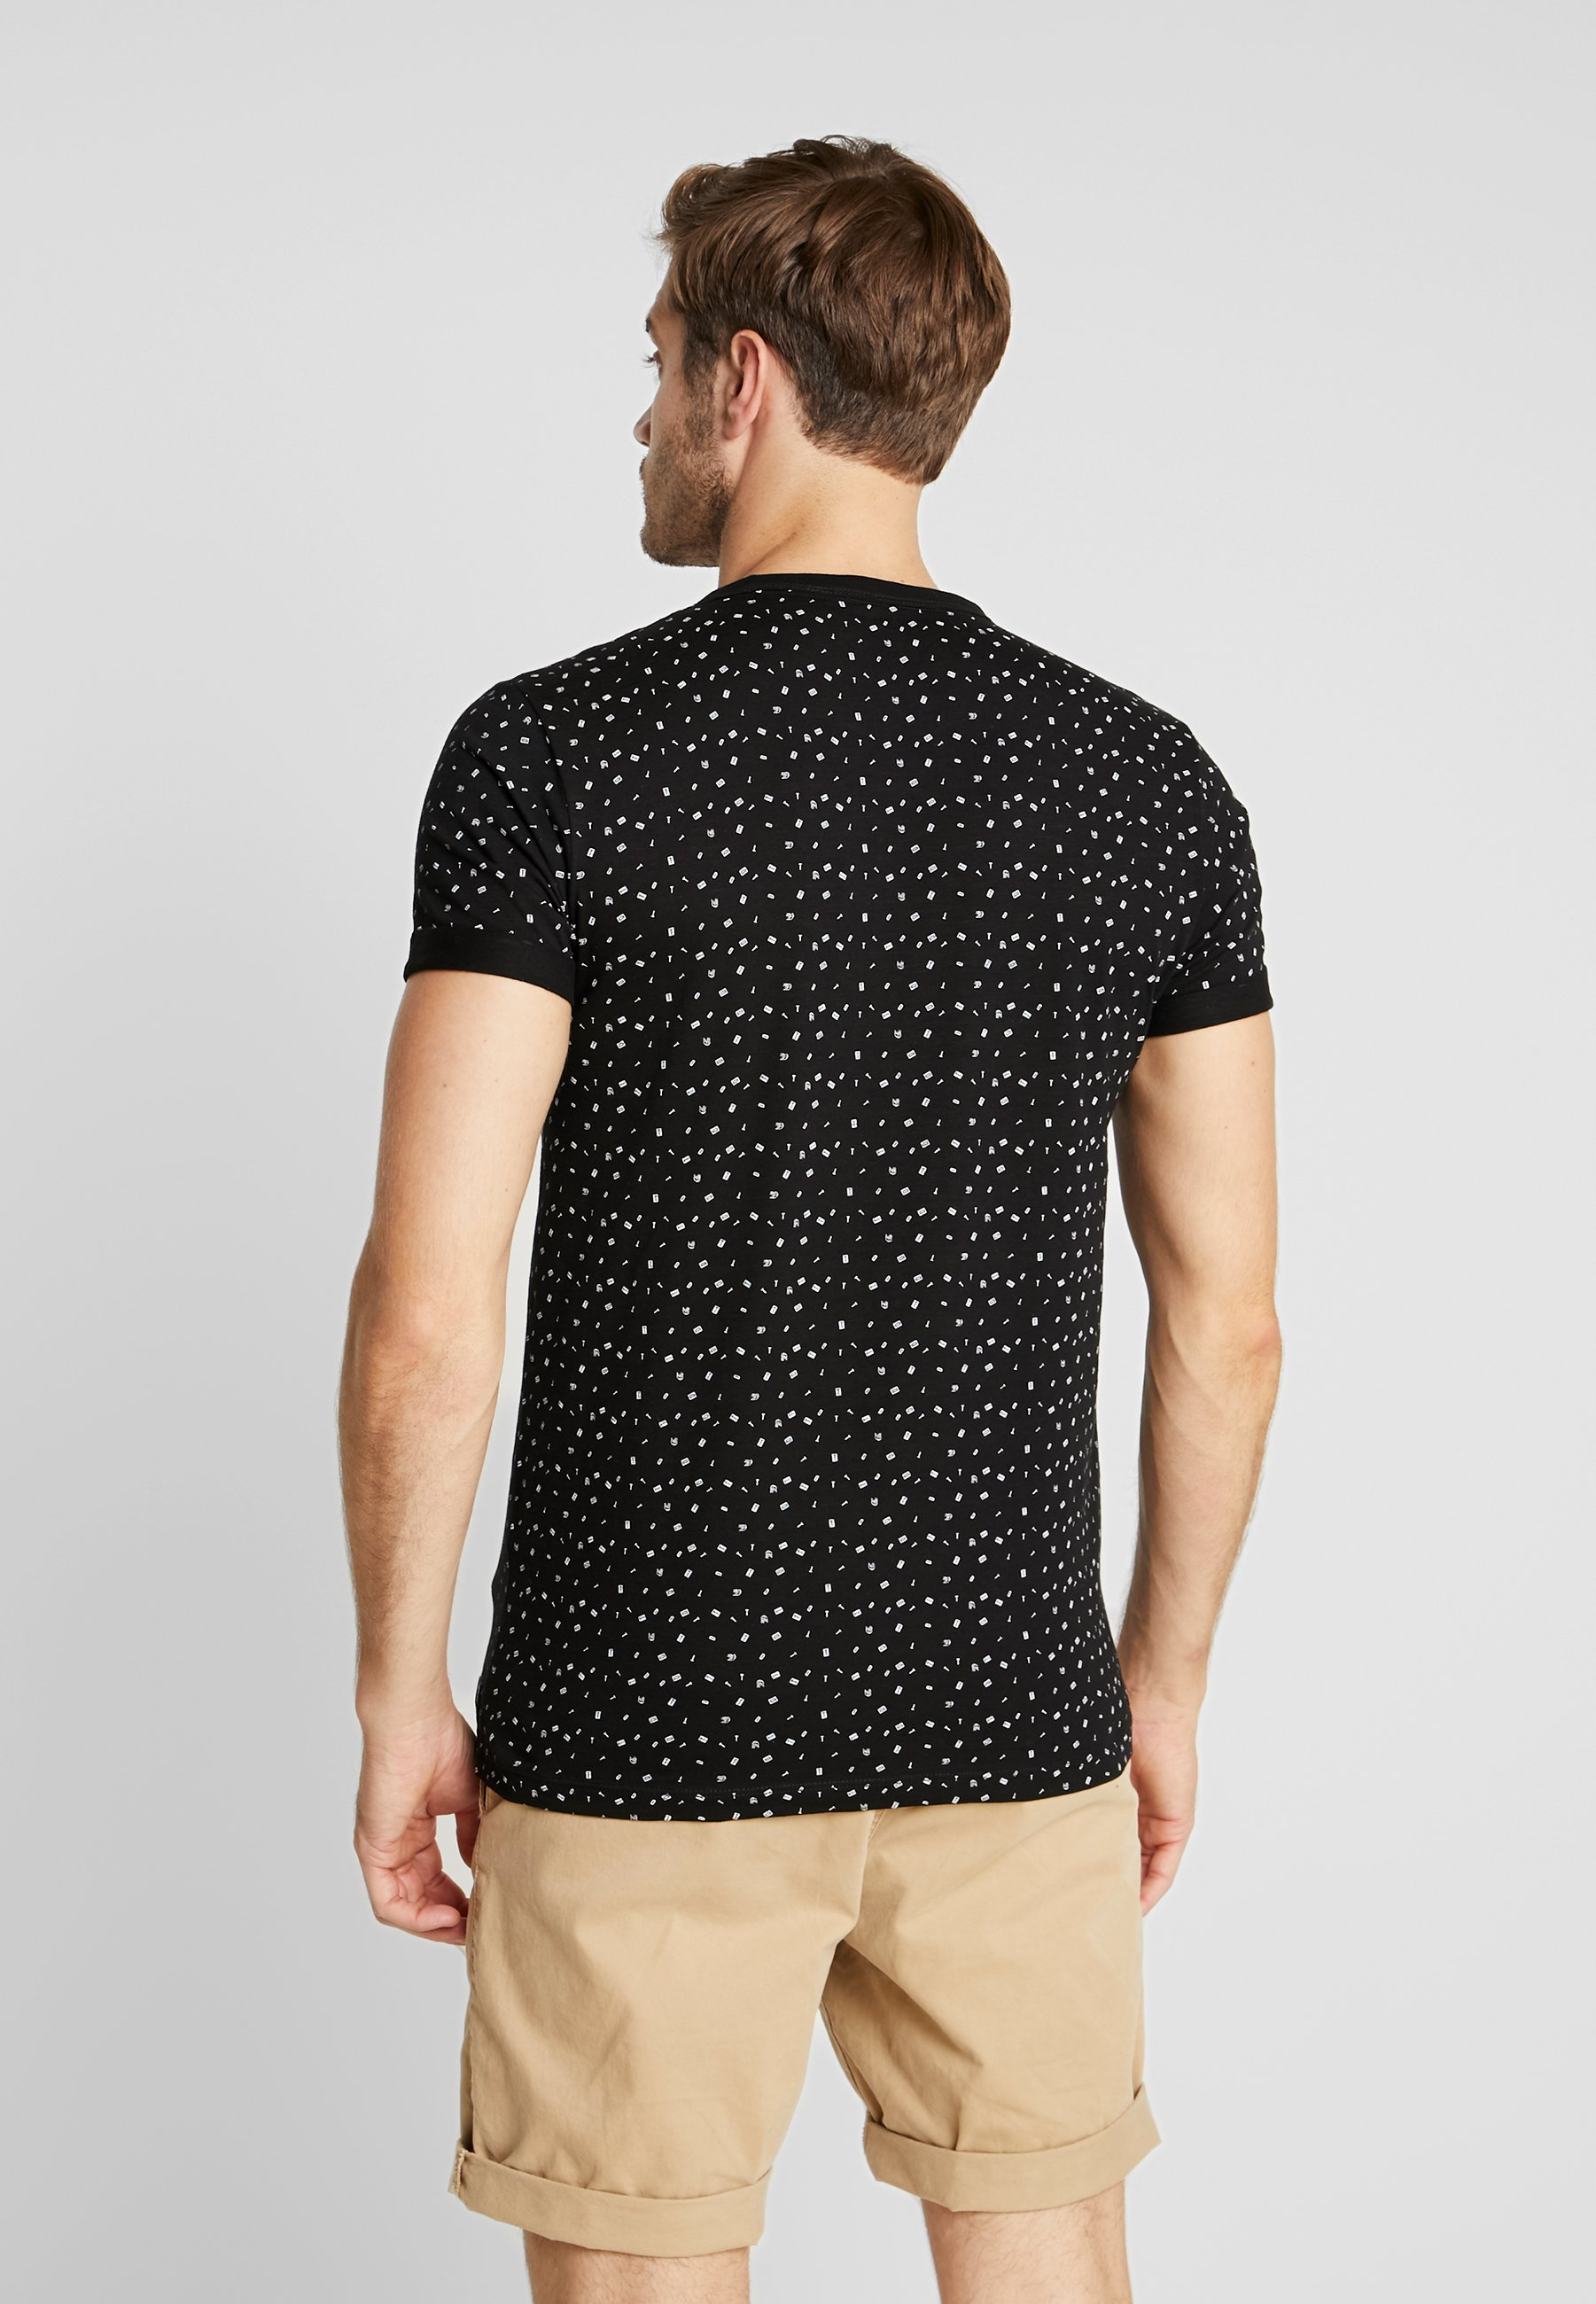 Tom Black Imprimé AlloverT Denim Tailor shirt 8nwv0NOm